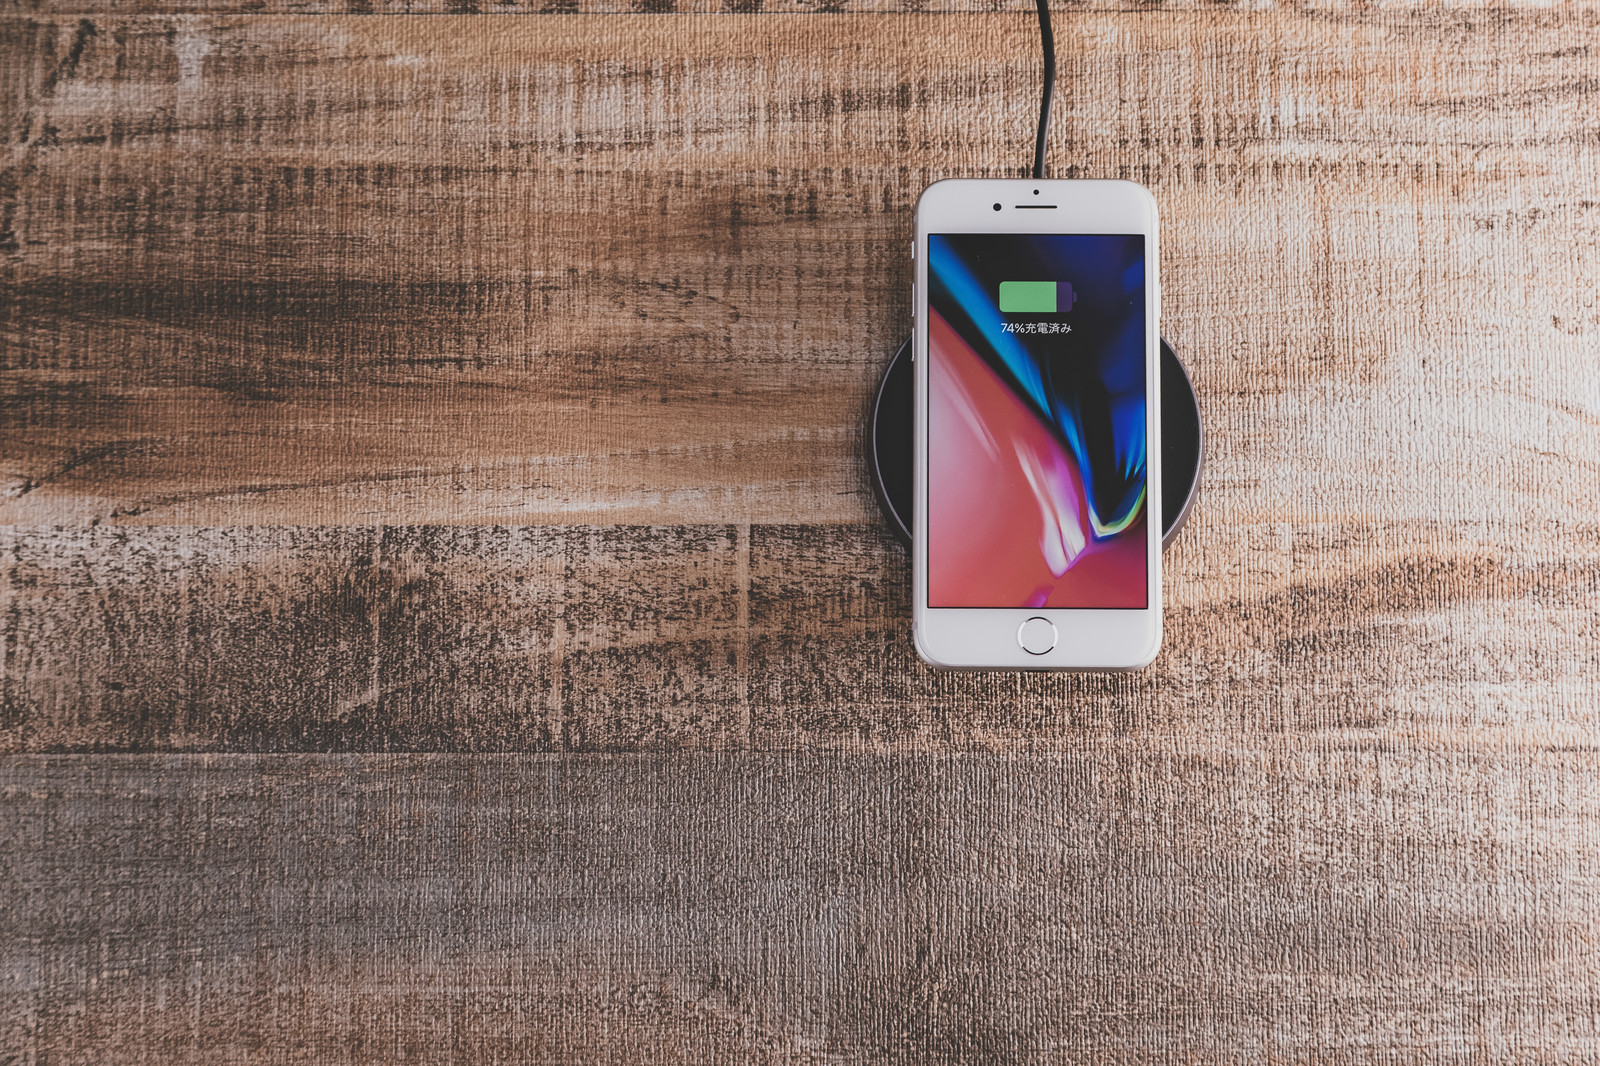 「iPhone をワイヤレス充電中」の写真